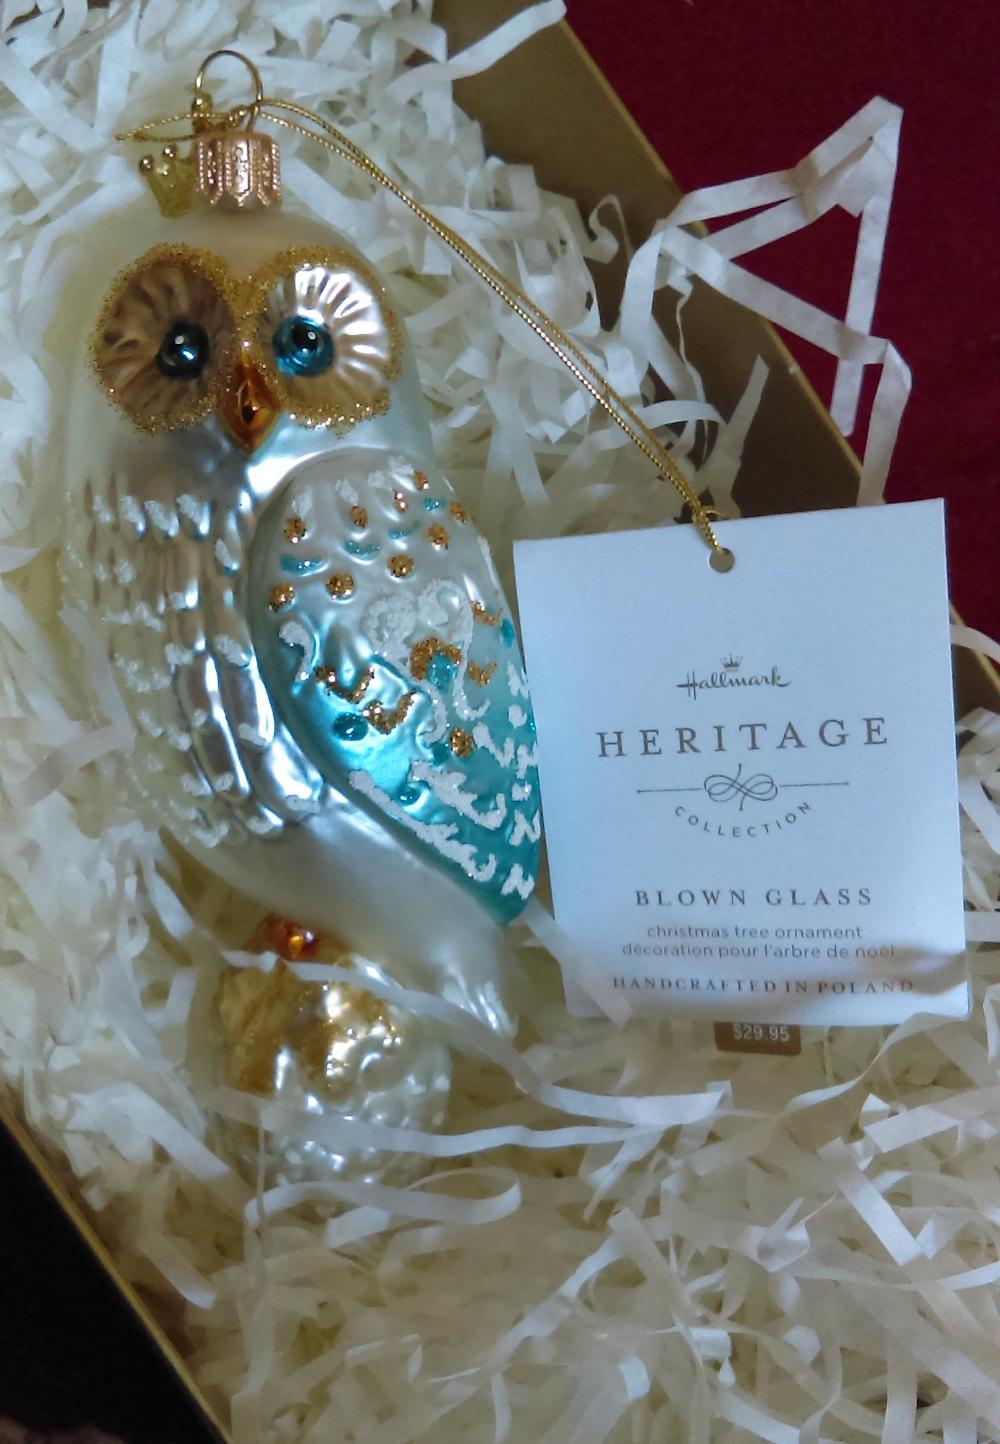 Hallmark Heritage Collection Ornaments